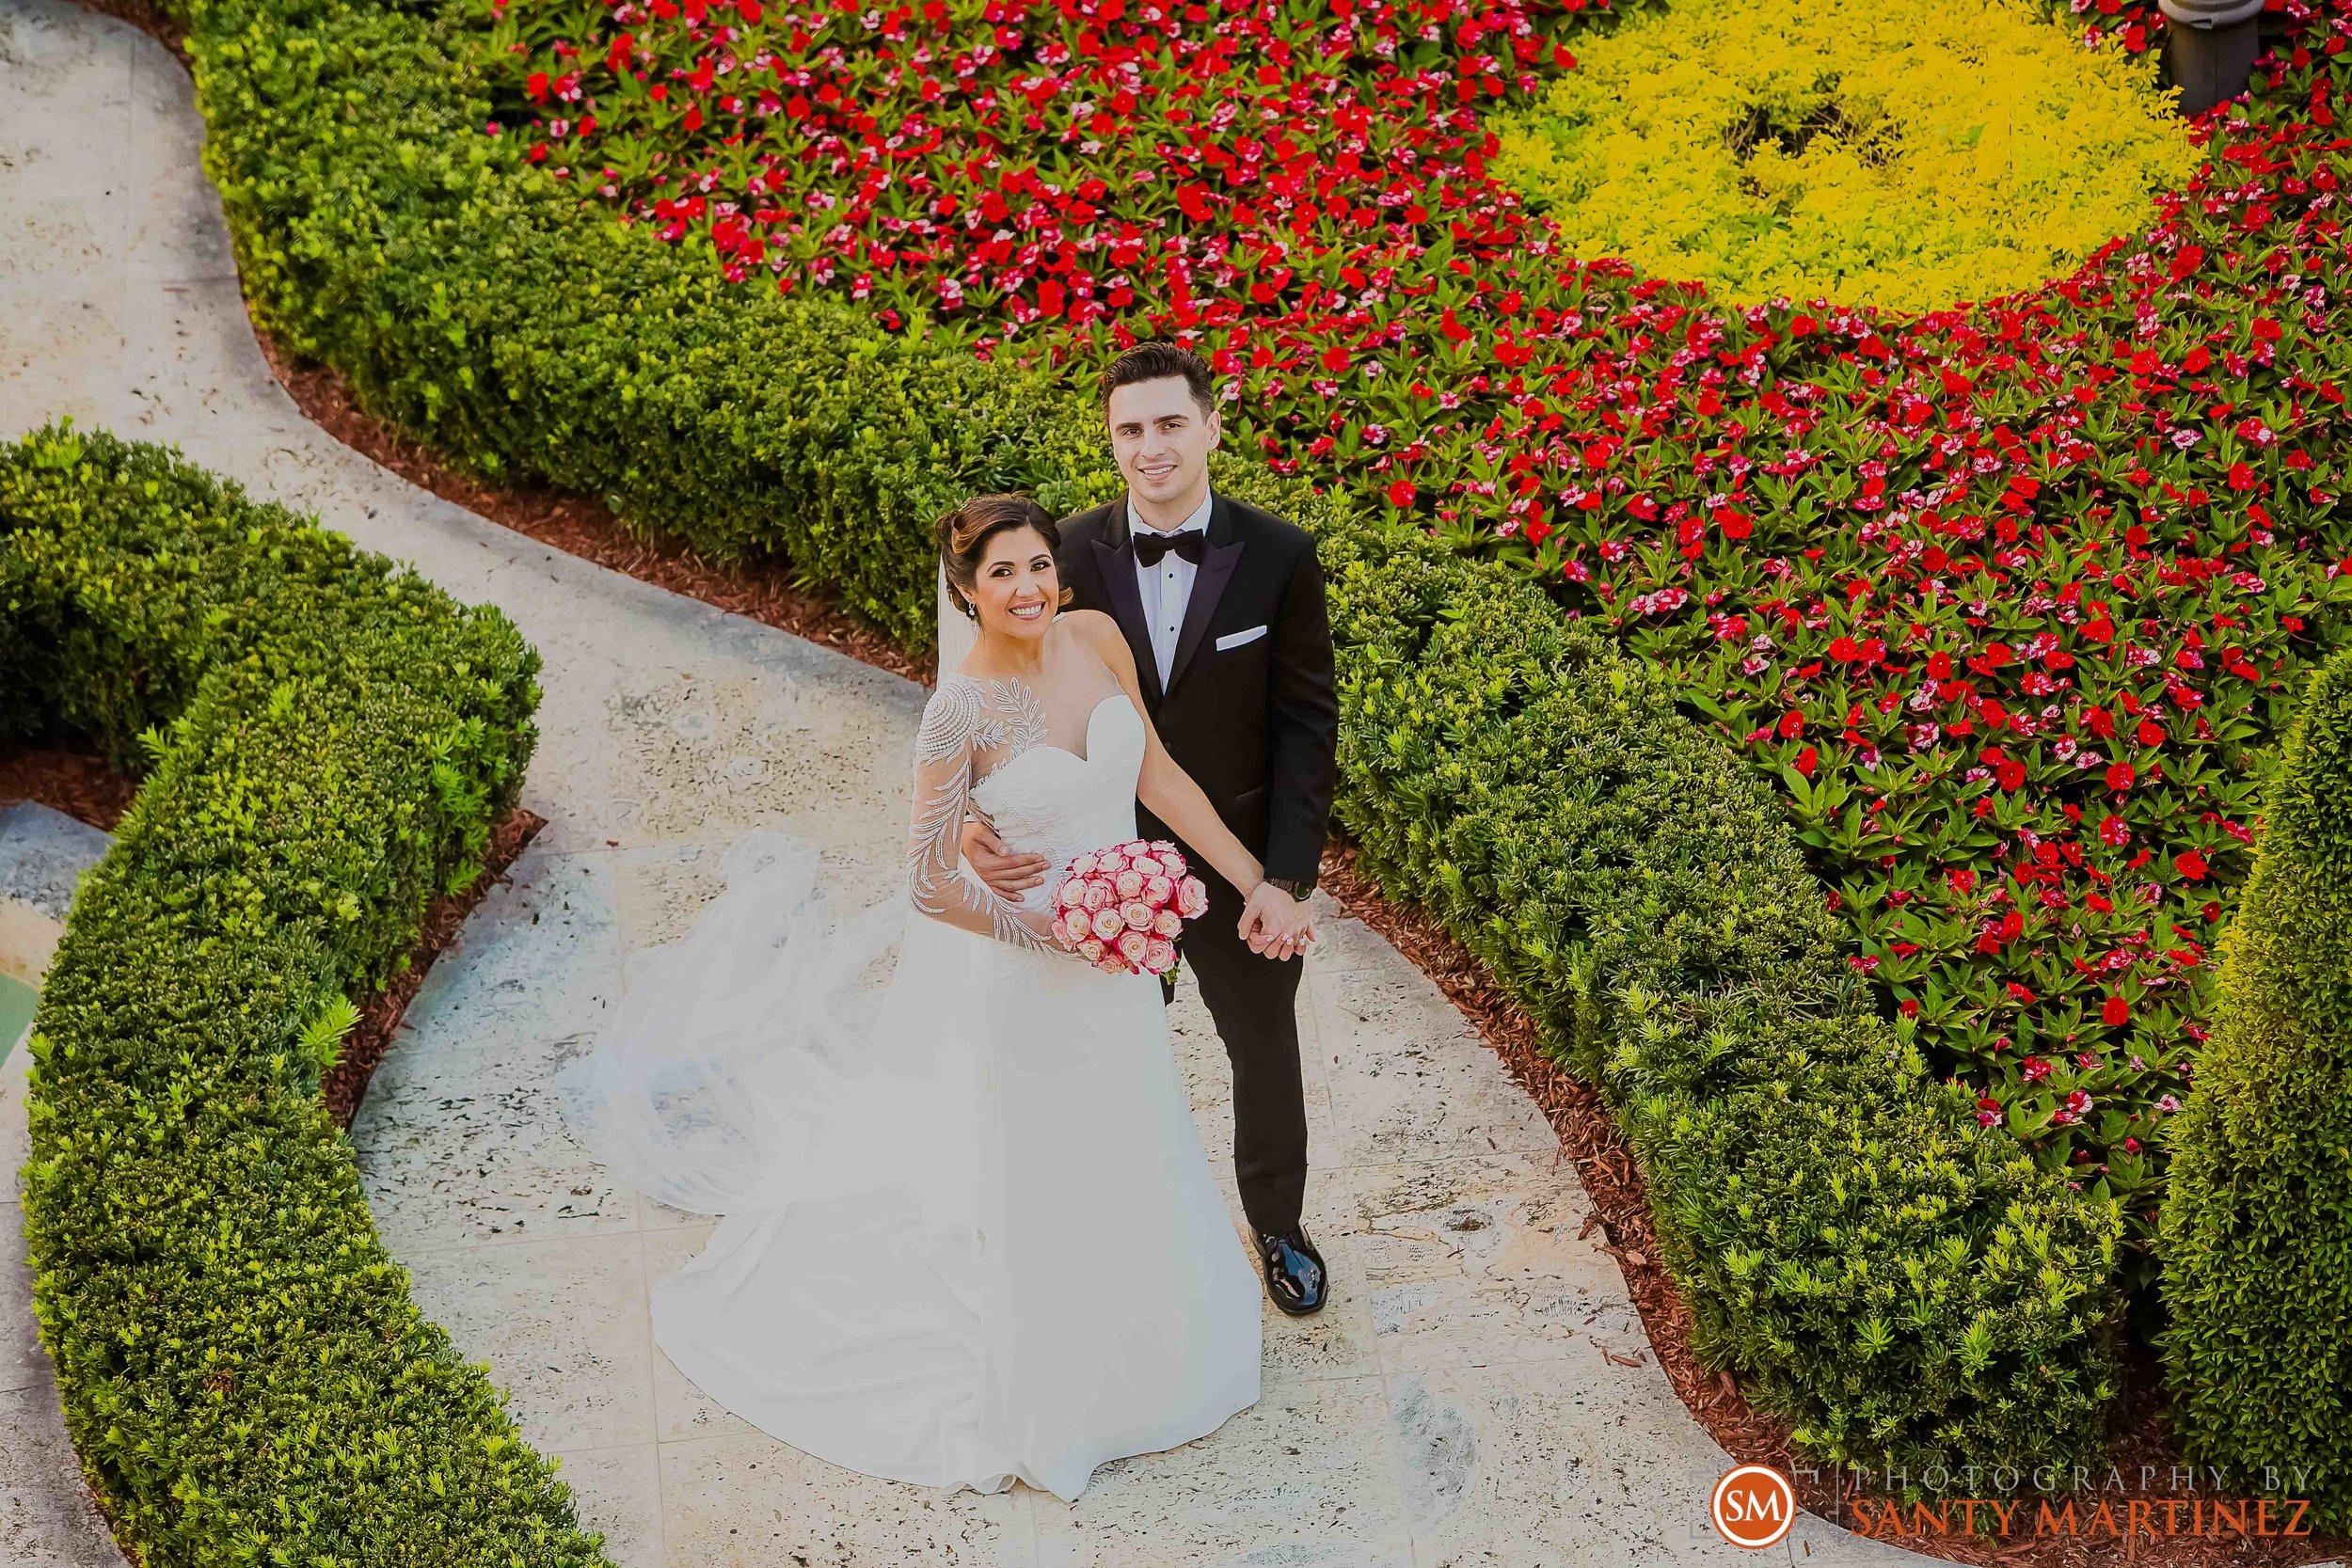 Wedding Trump National Doral Miami - Santy Martinez Photography-15.jpg